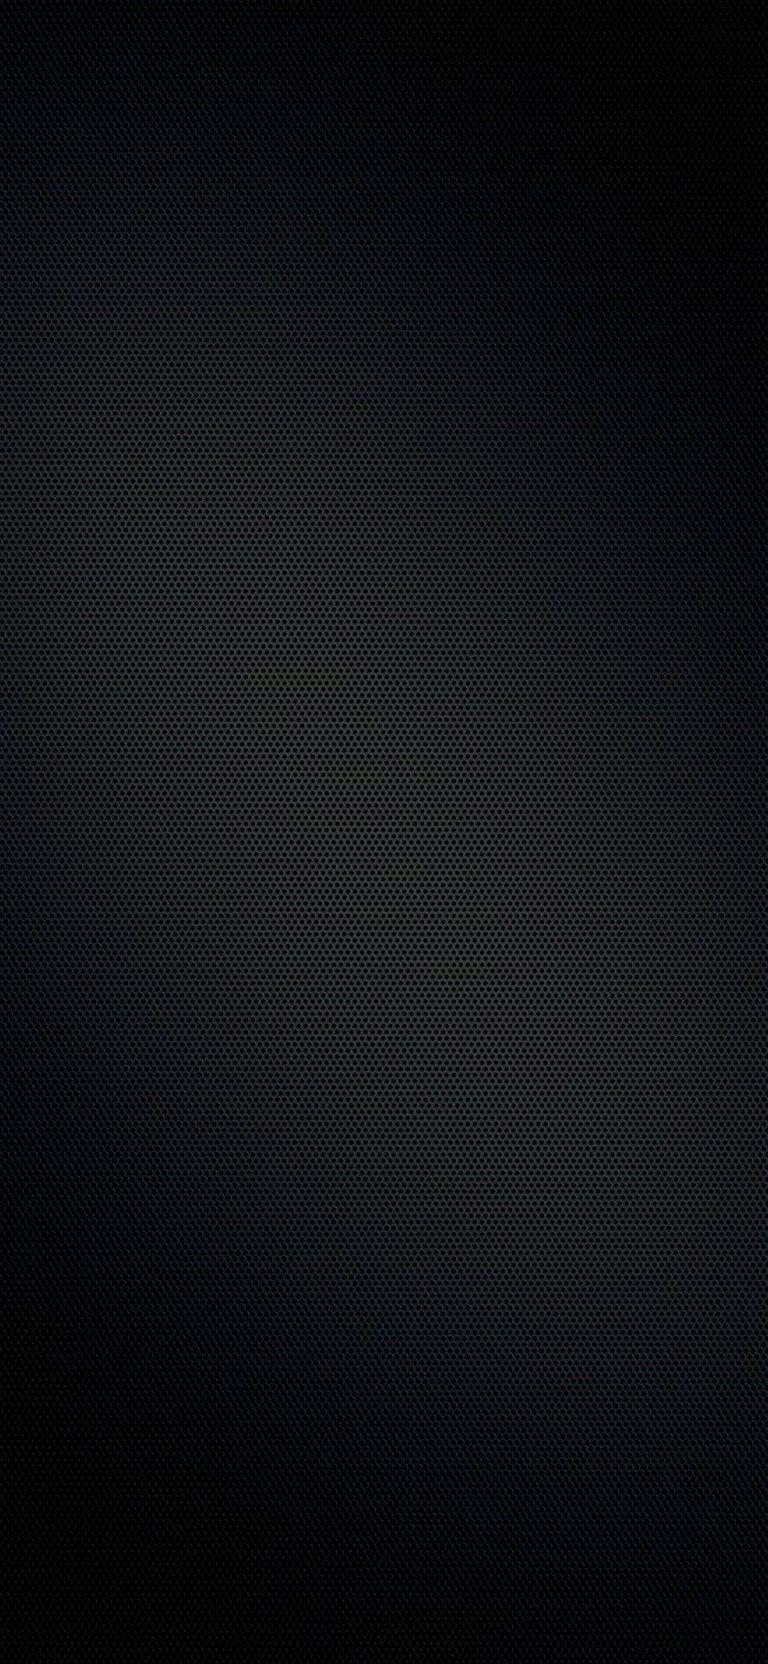 Black Phone Wallpaper [1080x2340] - 146